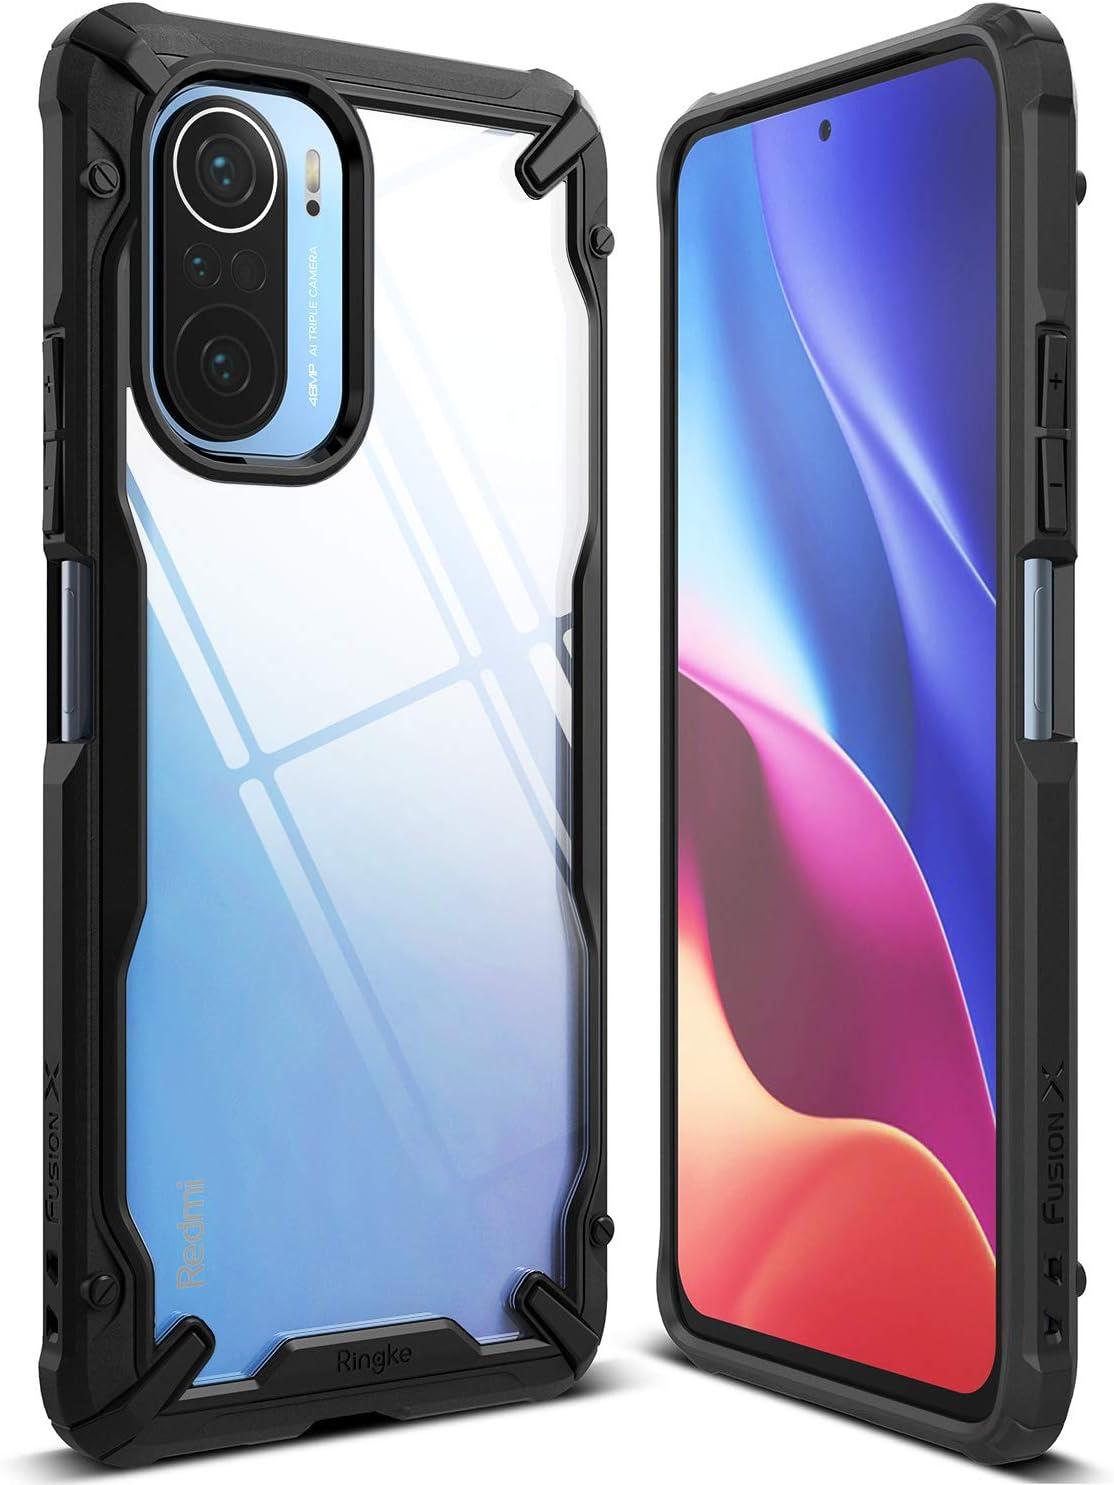 Ringke Fusion-X Compatible con Funda Xiaomi Poco F3, Compatible con Funda Xiaomi Mi 11i (6,67 Pulgadas), Trasera Transparente Parachoque a Prueba de Golpes Carcasa Protectora - Black